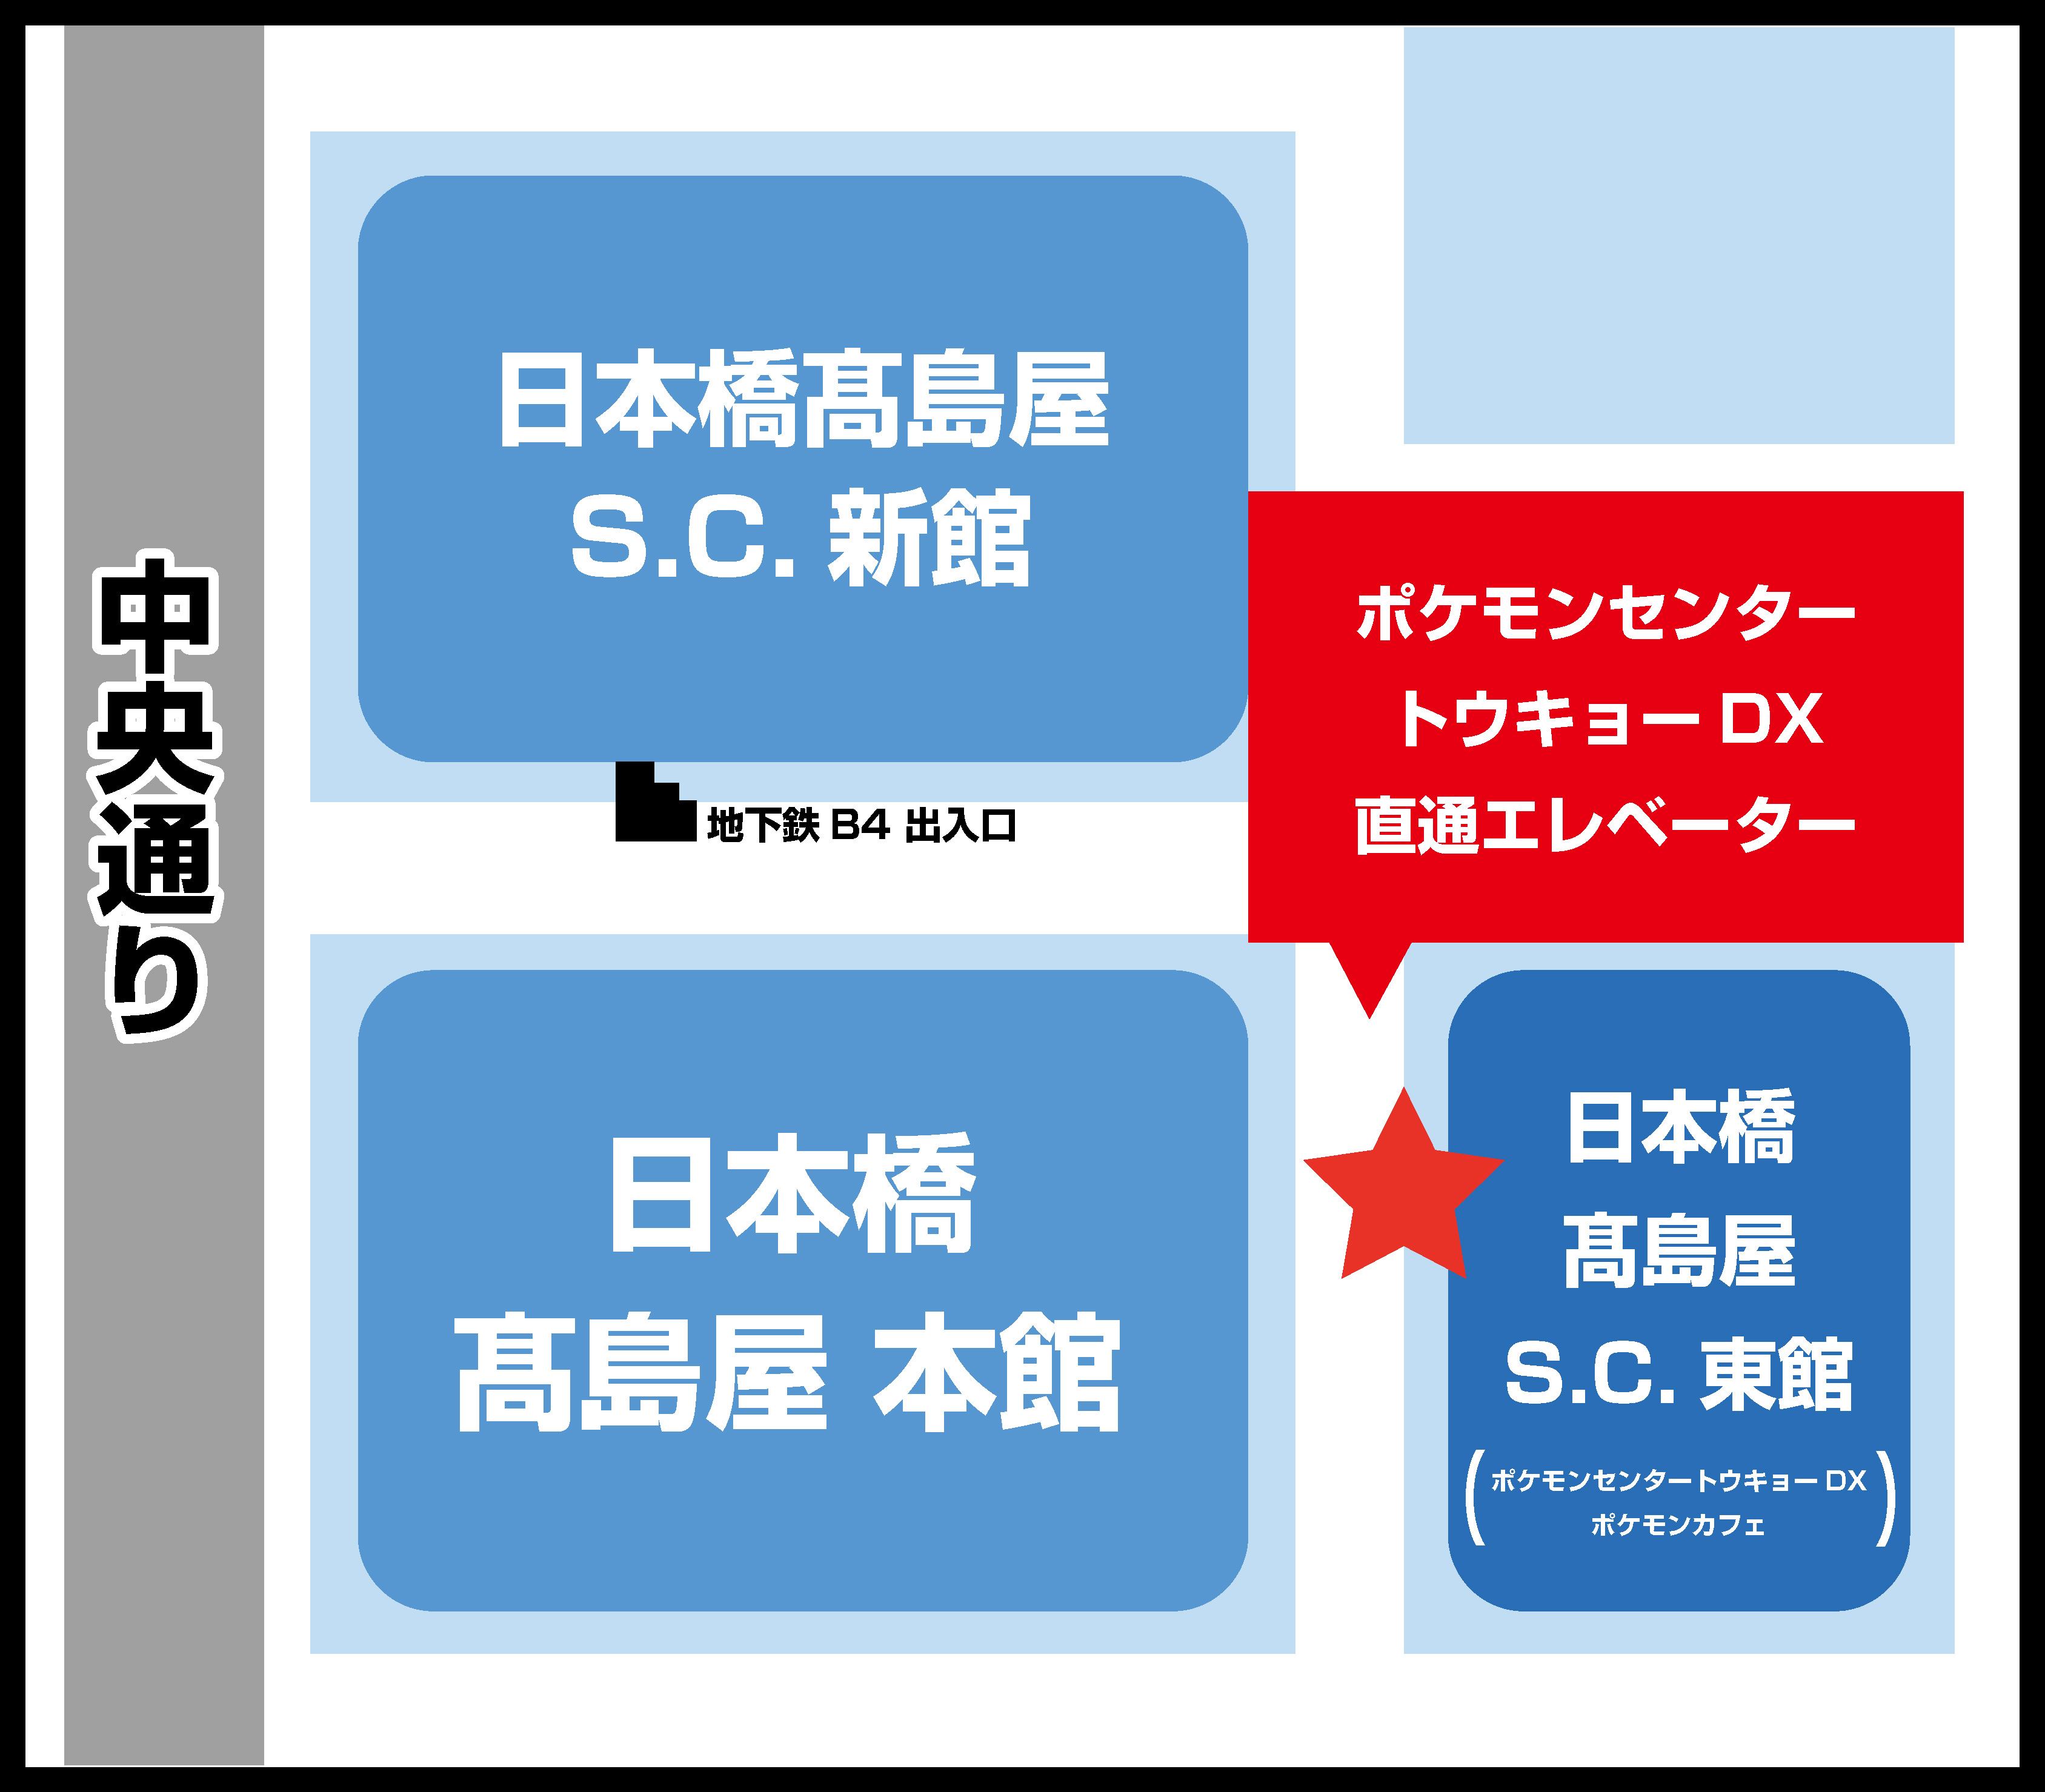 https://voice.pokemon.co.jp/stv/tokyodx/%E6%97%A5%E6%9C%AC%E6%A9%8B%E9%AB%99%E5%B3%B6%E5%B1%8B%E5%9C%B0%E5%9B%B301.jpg